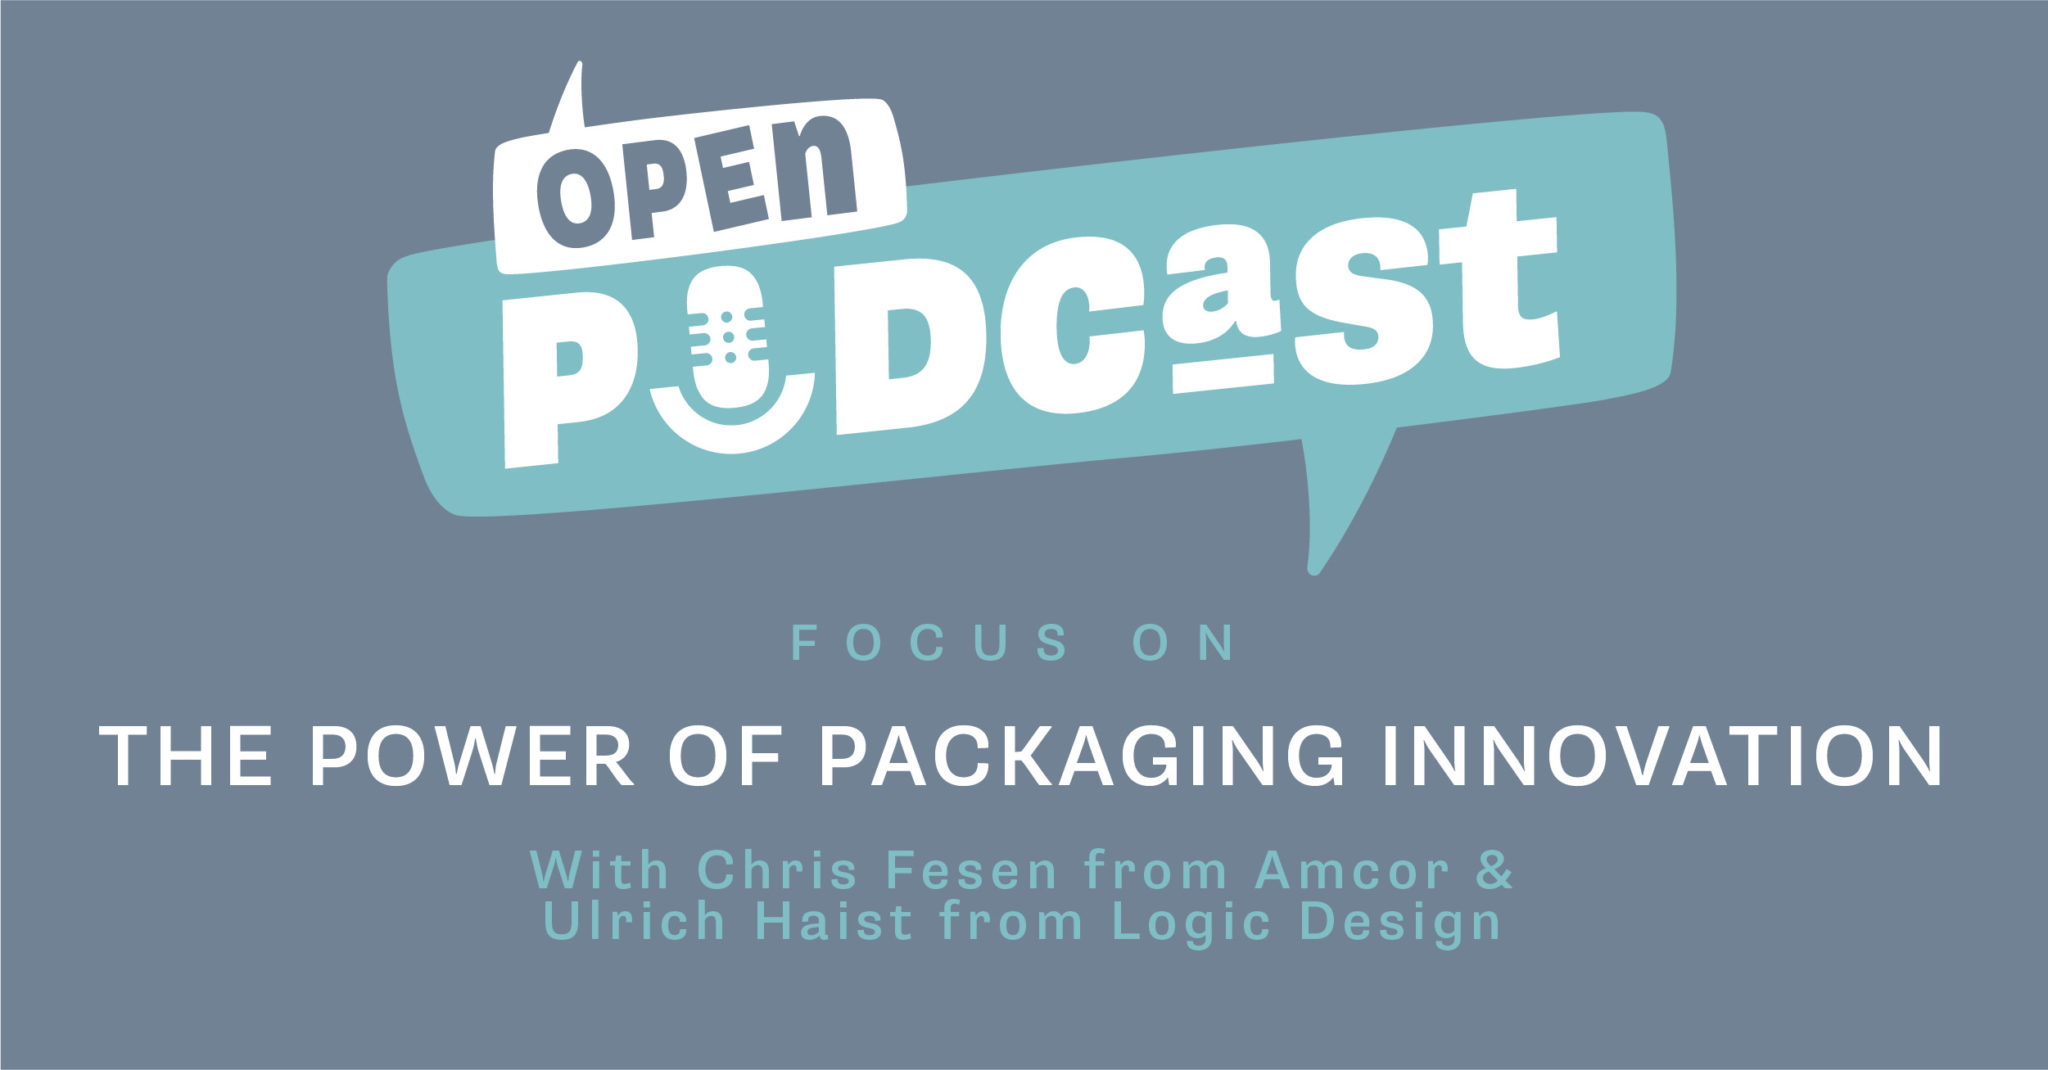 Open Poscast